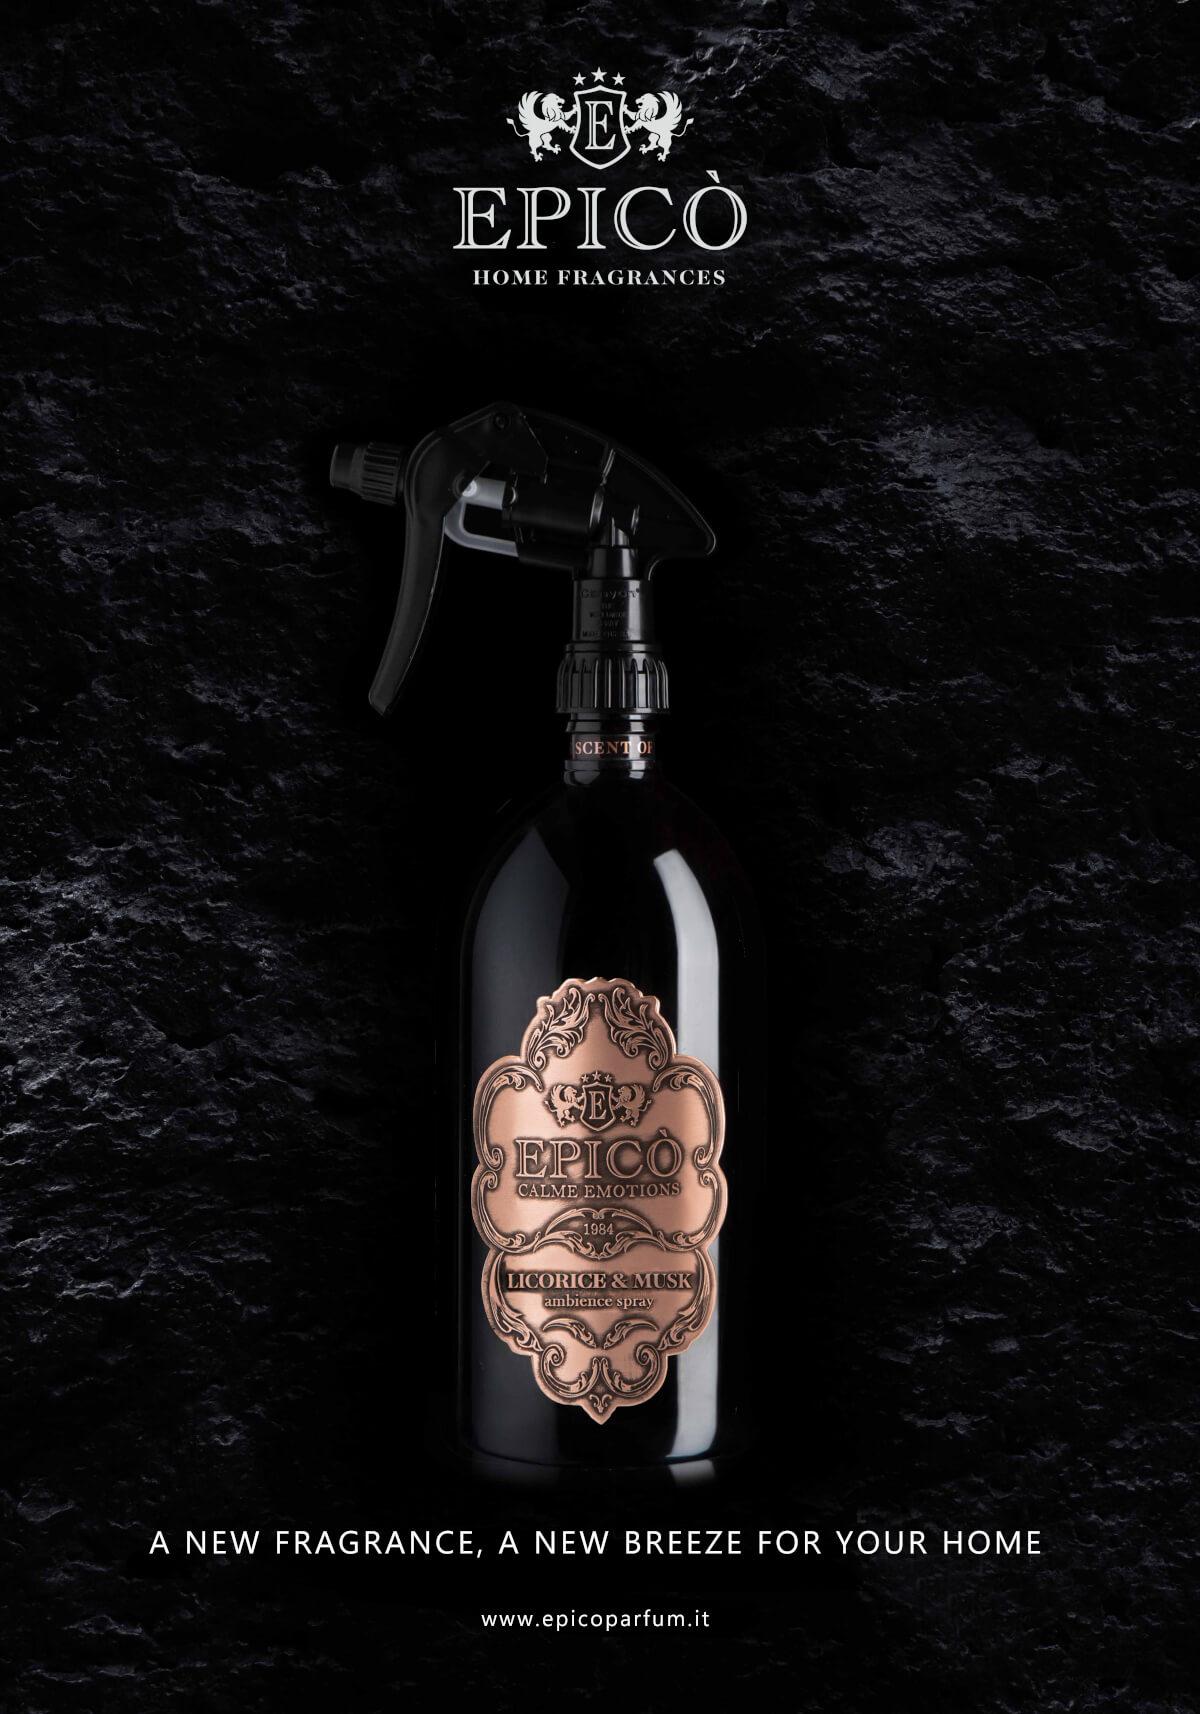 Epicò - Licorice & Musk